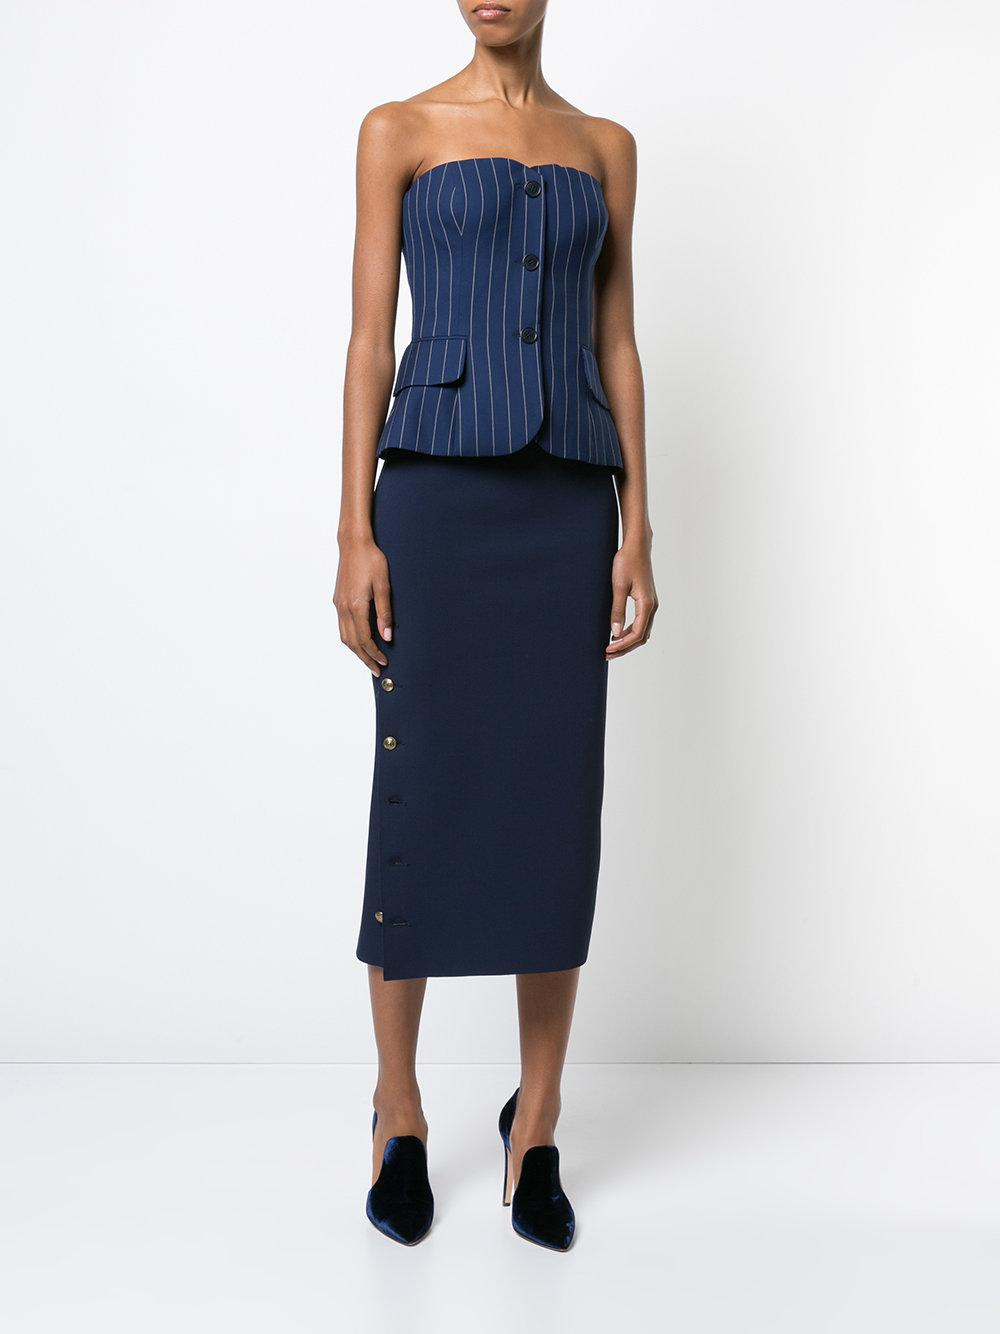 90159e0e204 Lyst - Ralph Lauren Collection Pinstripe Corset Top in Blue - Save 24%